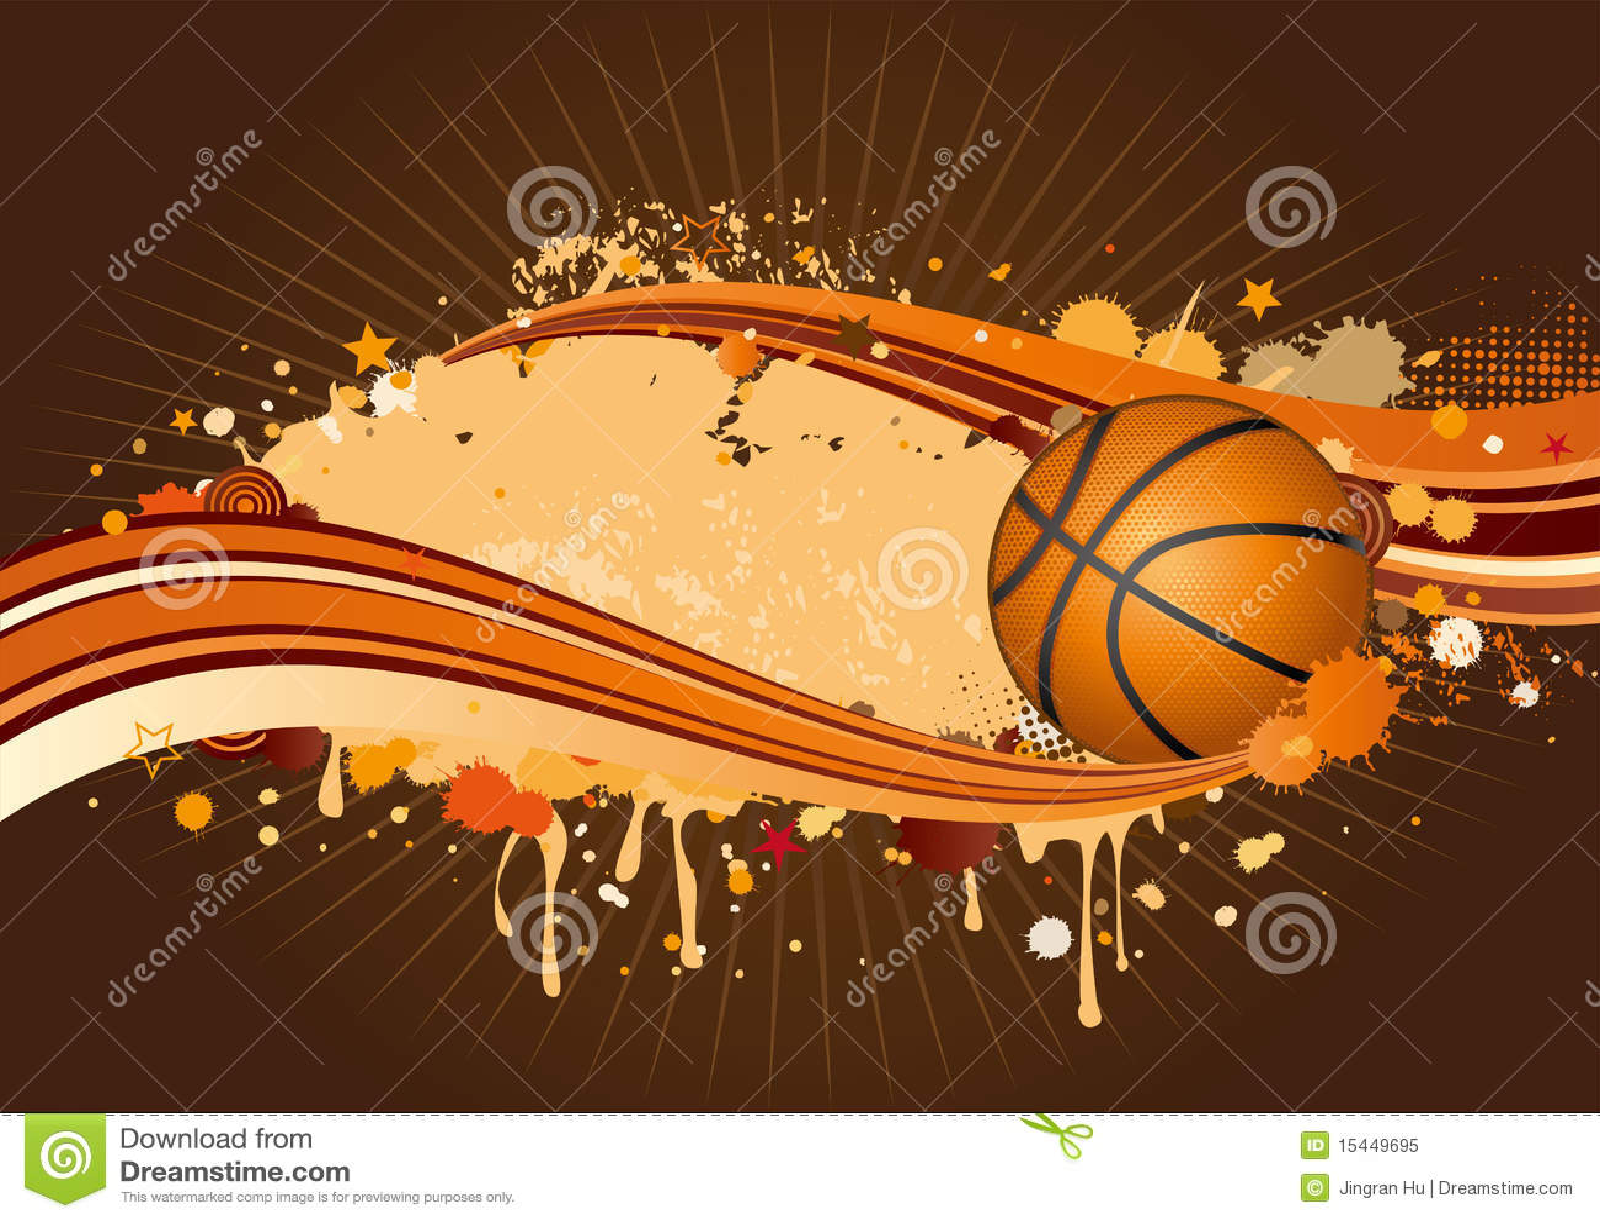 basketball background stock vector illustration of ball 15449695